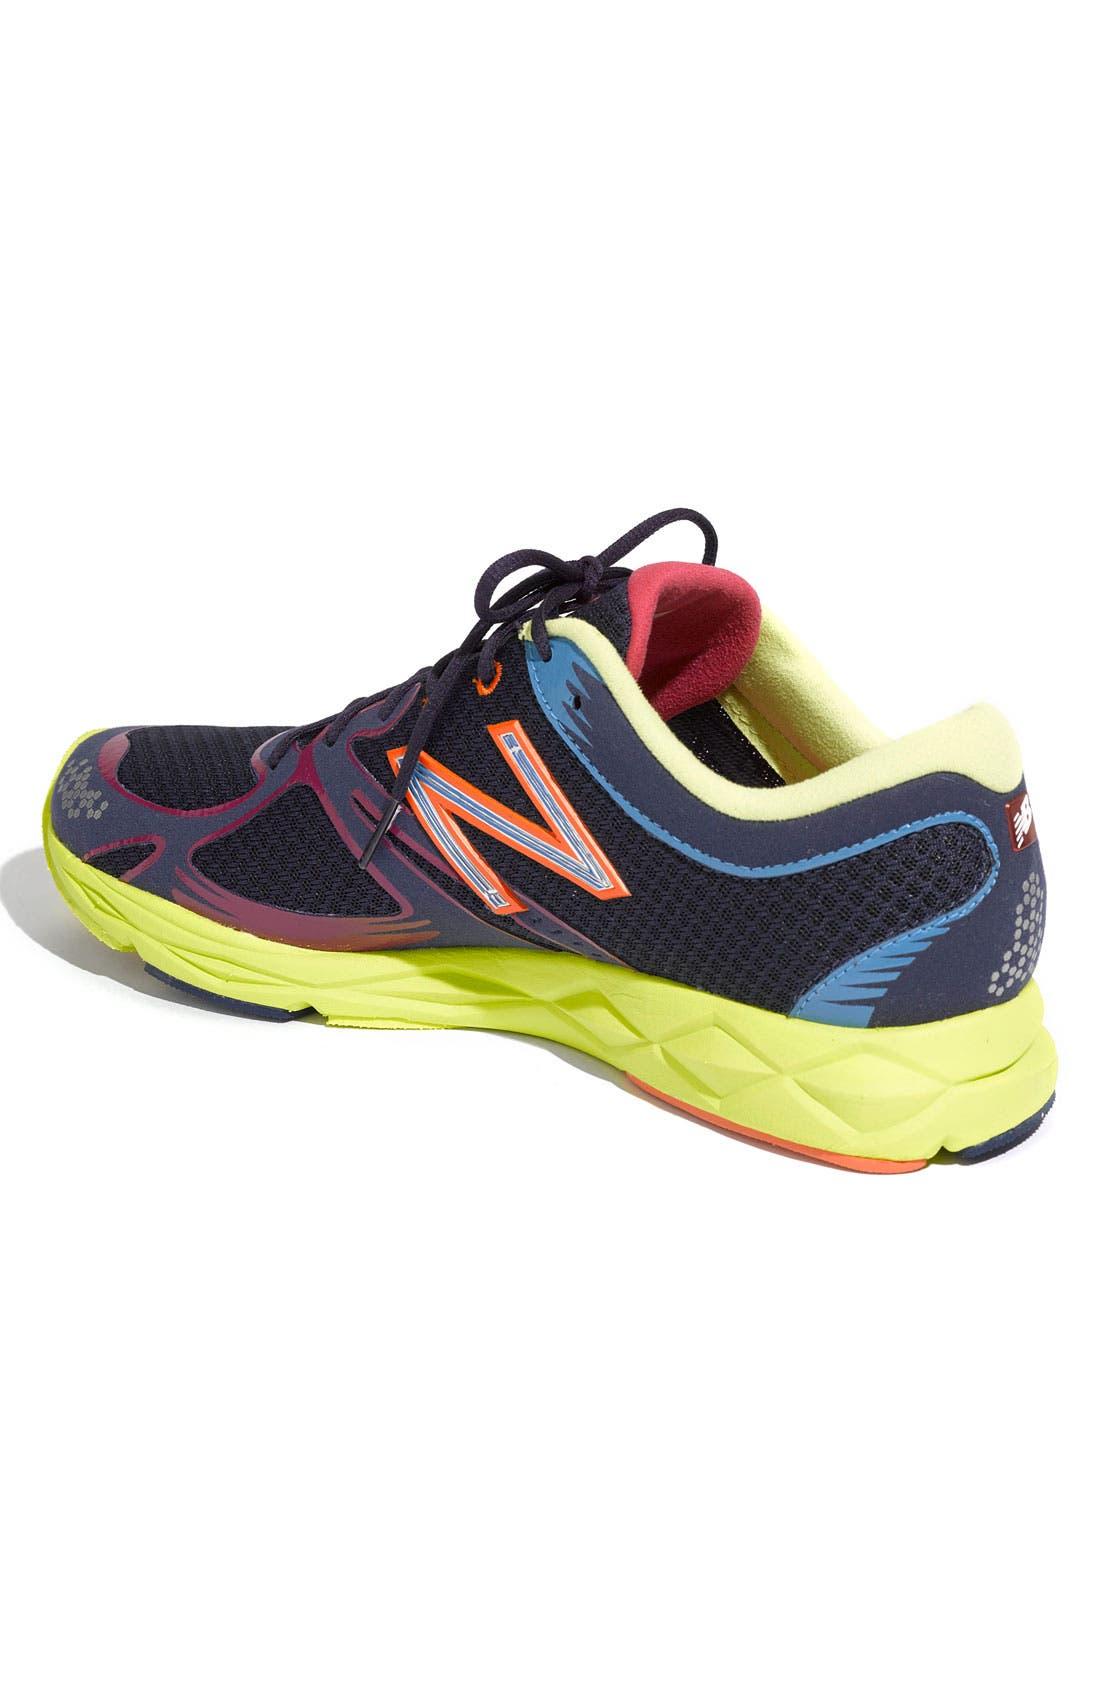 Alternate Image 2  - New Balance '1400' Running Shoe (Men)